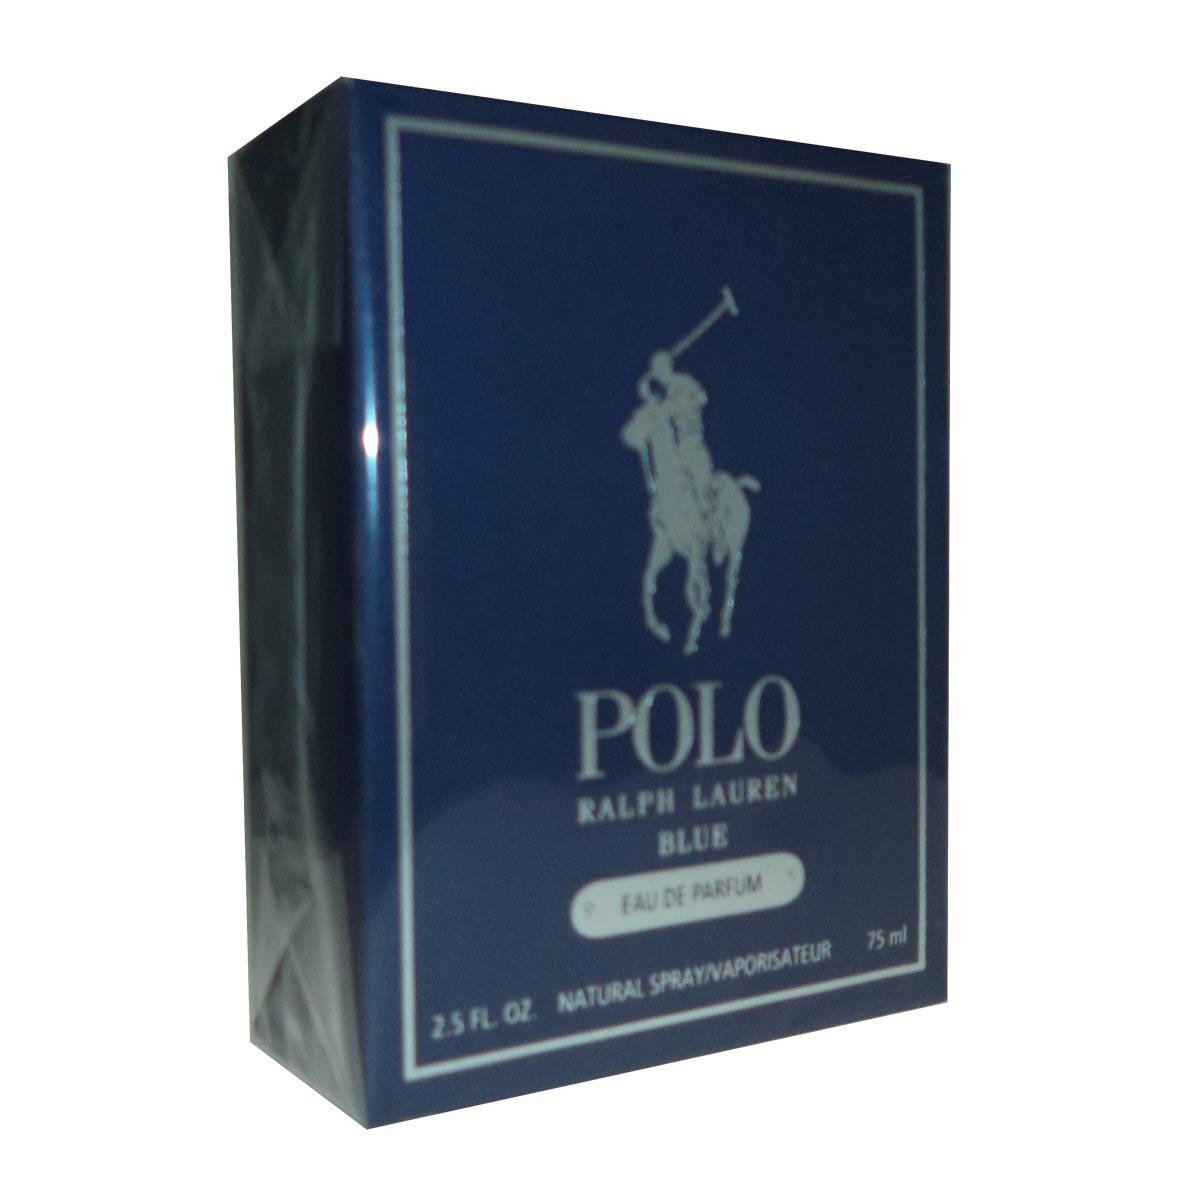 Ralph lauren polo blue eau de parfum 75ml vaporizador